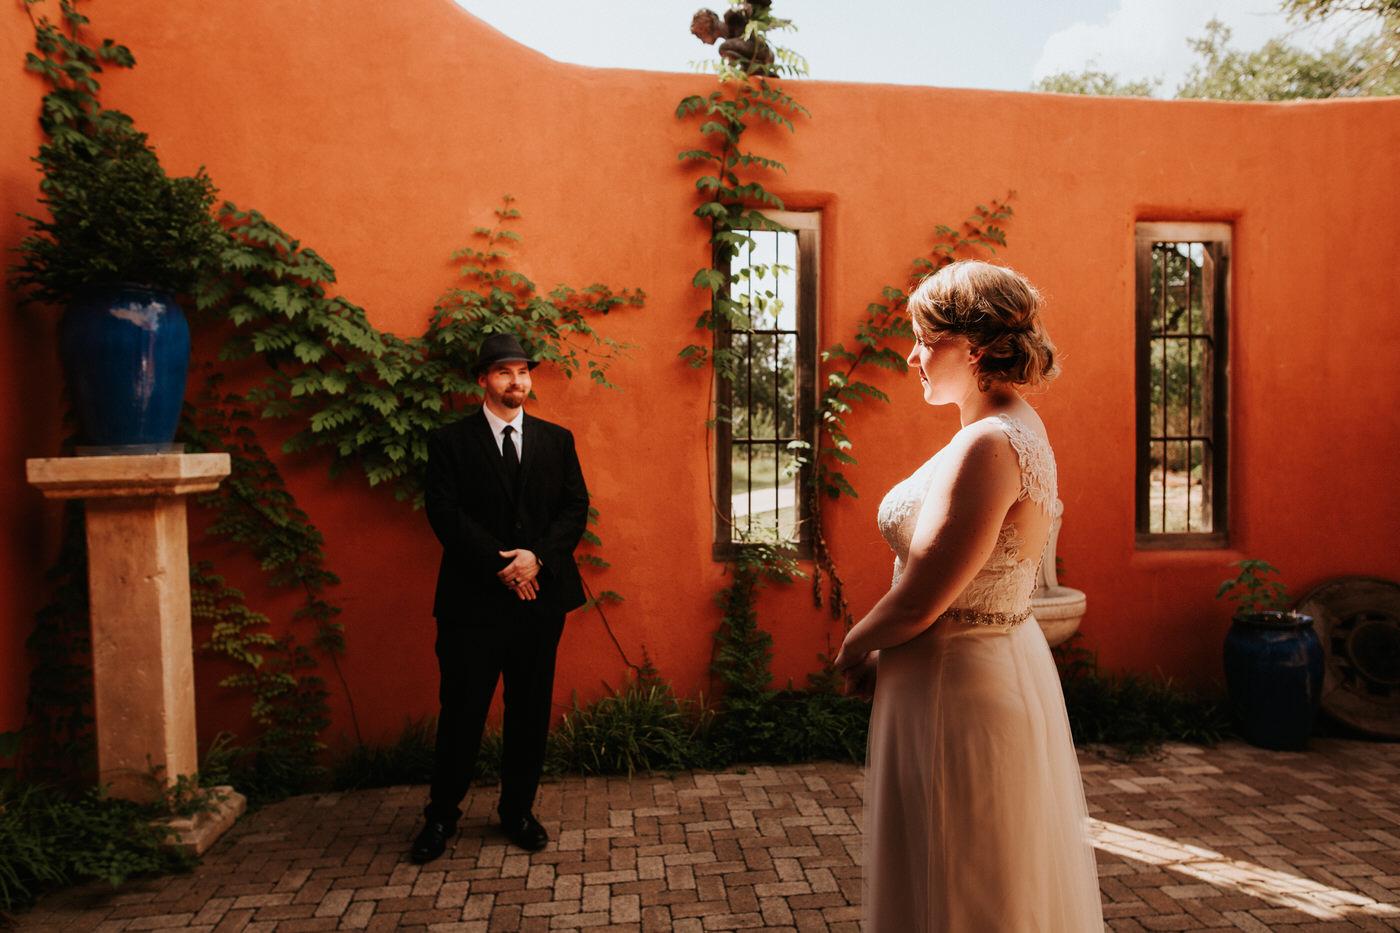 Chapel Dulcinea Elopement Wedding - Diana Ascarrunz Photography-341.jpg